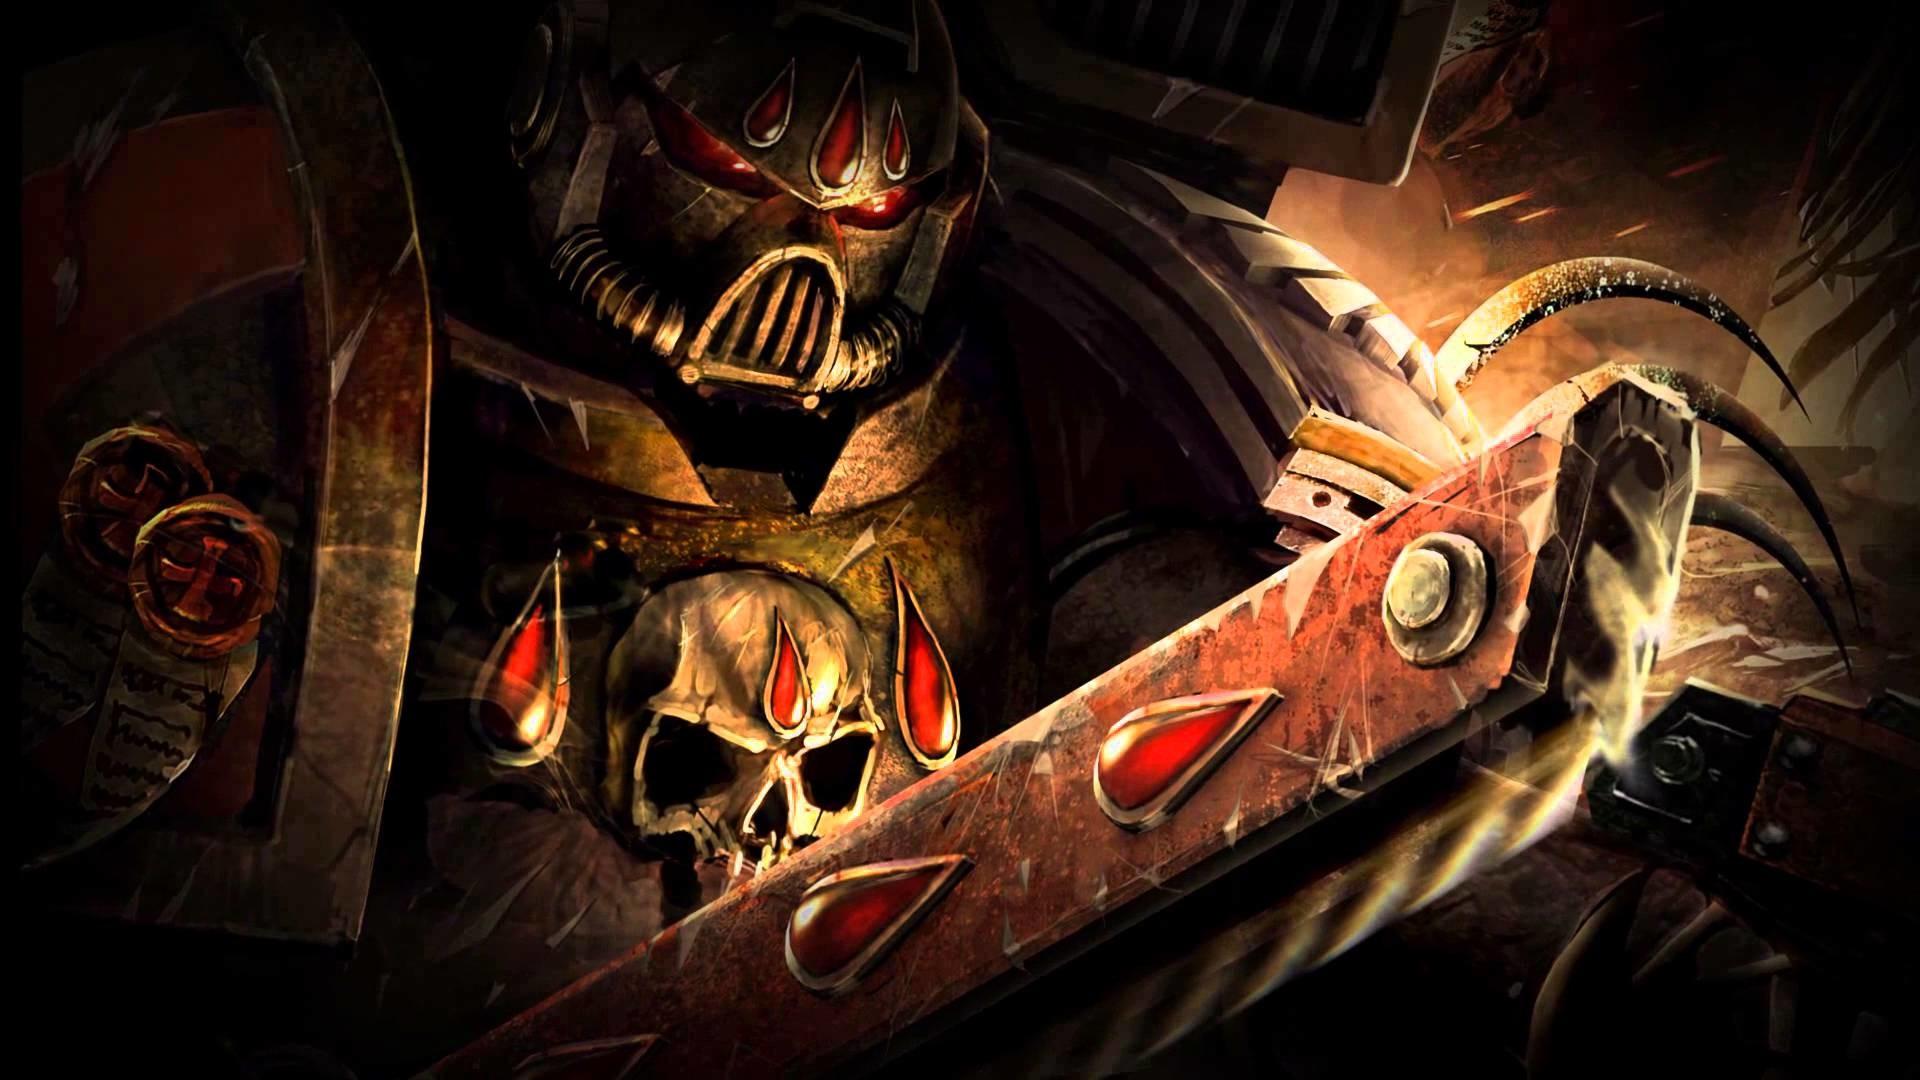 Warhammer 40K Blood Angels Wallpaper – WallpaperSafari